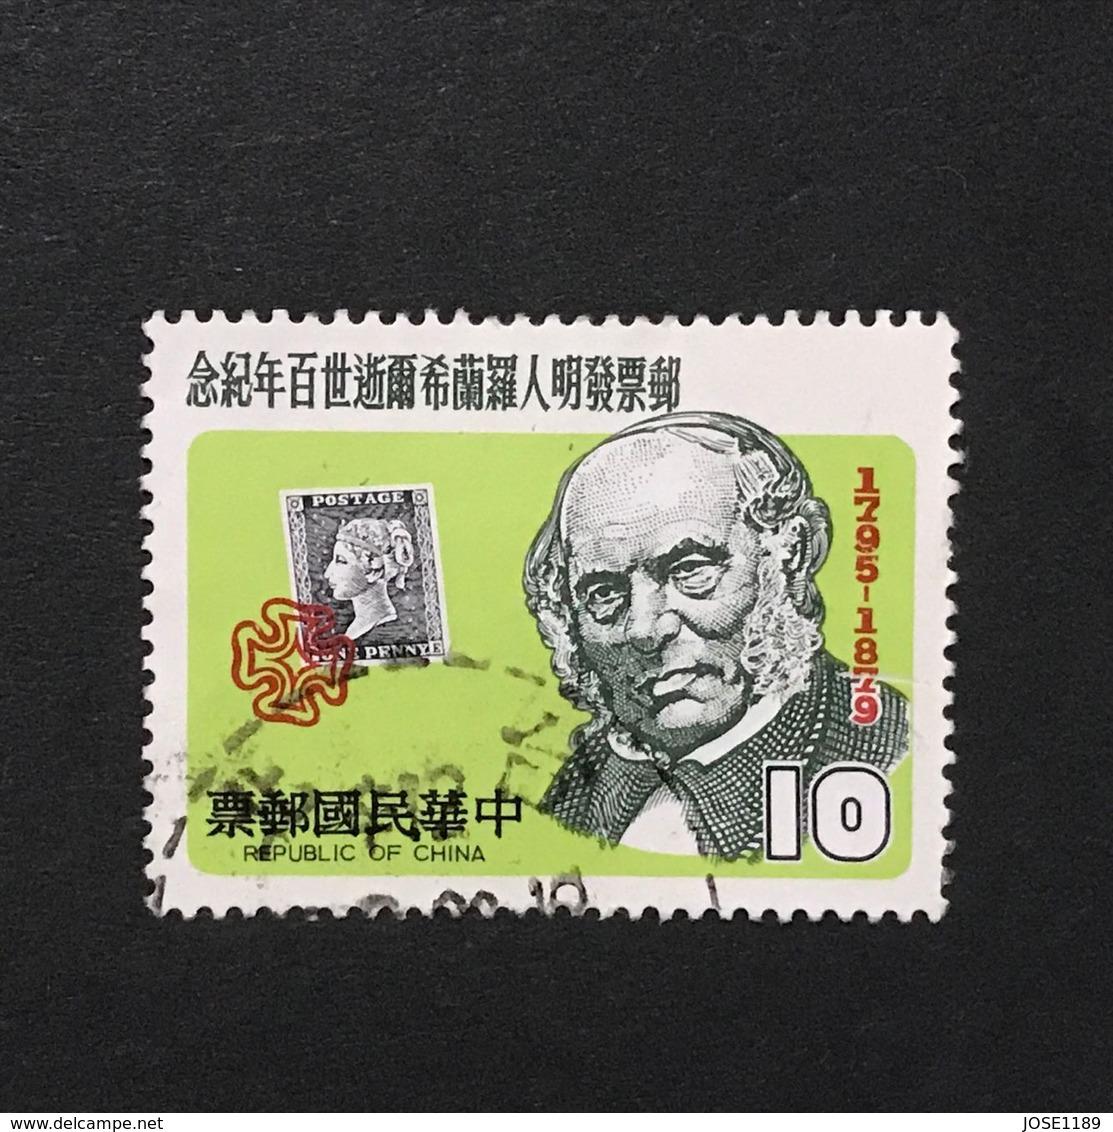 ◆◆◆Taiwán (Formosa)   1979   Sir Rowland Hill (1795-1879), Originator Of  Penny Postage. .    $10   USED  AA2368 - 1945-... República De China